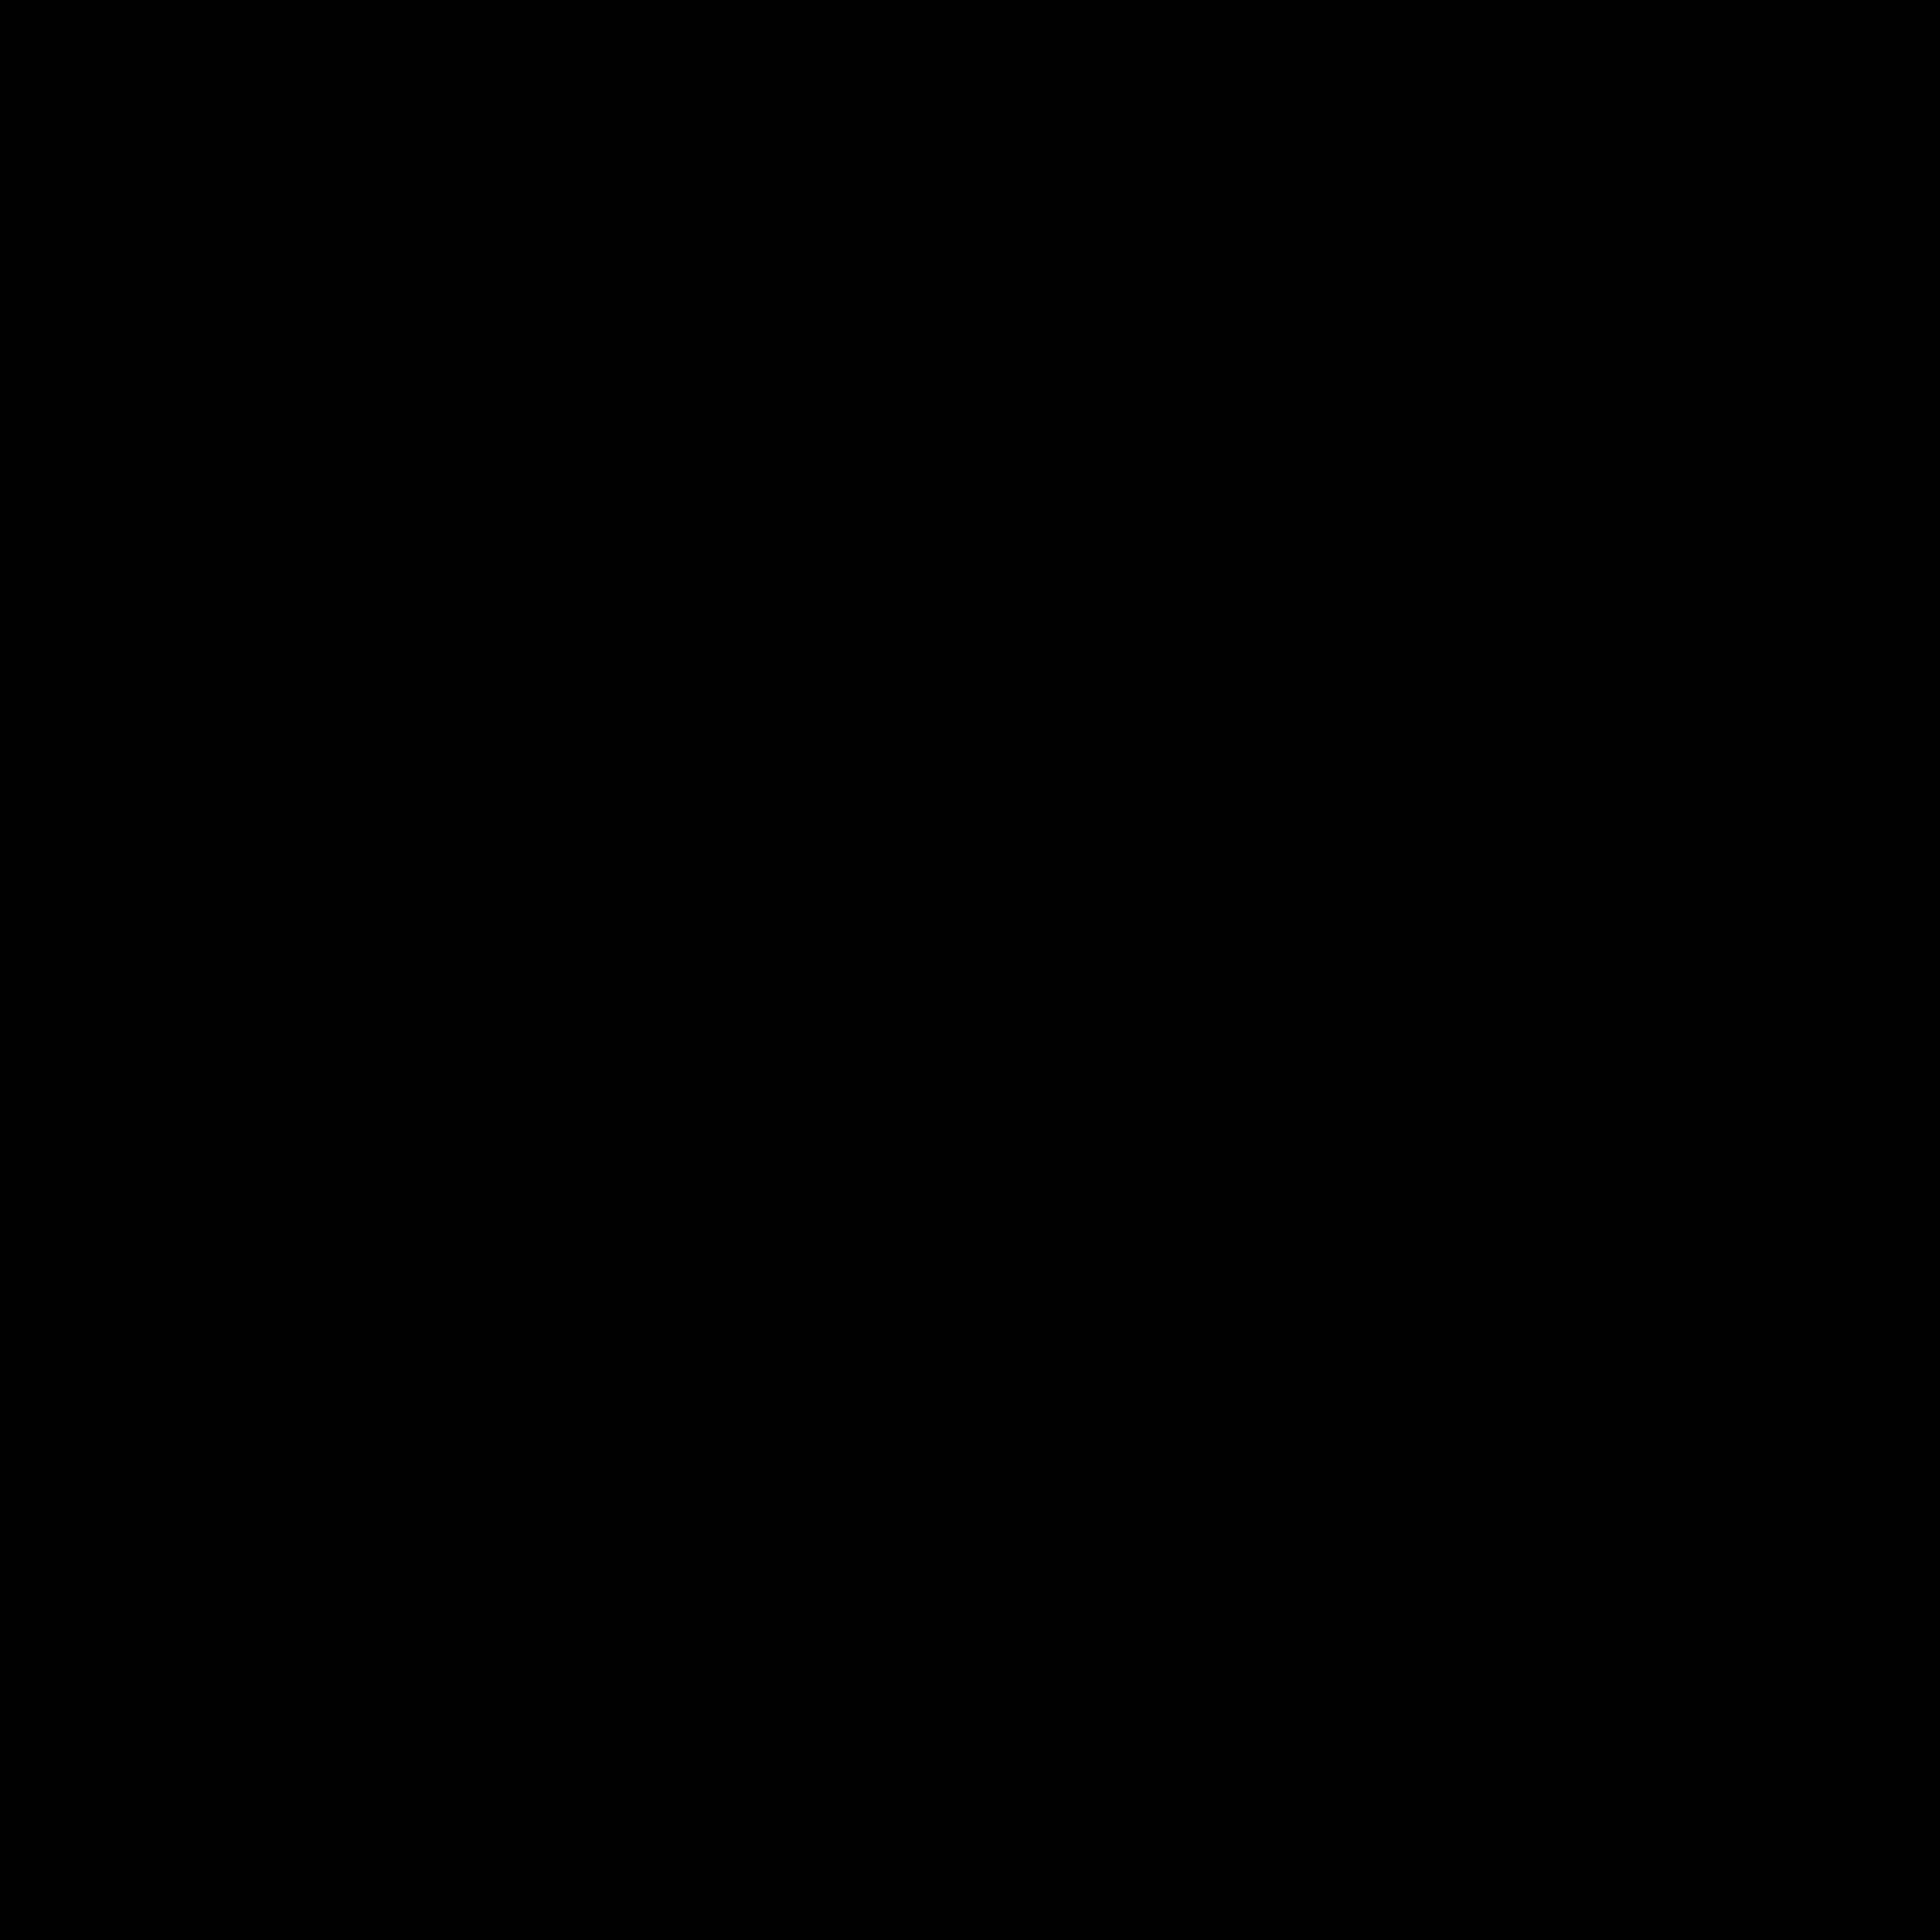 Henohenomoheji. Japanese clipart hiragana